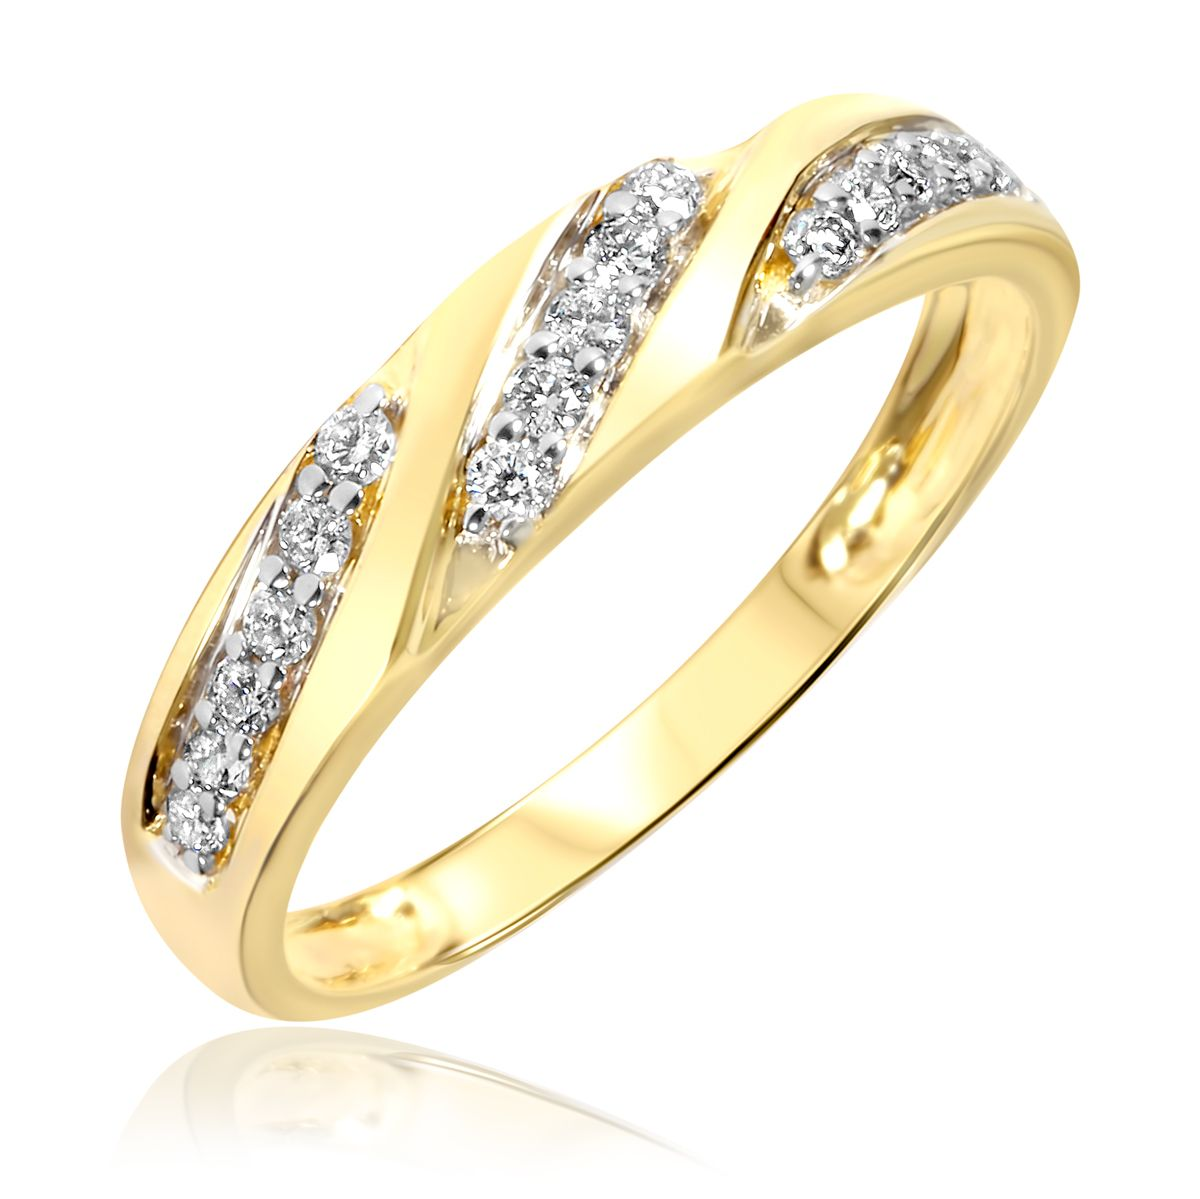 1/4 Carat T.W. Diamond Women's Wedding Ring 14K Yellow